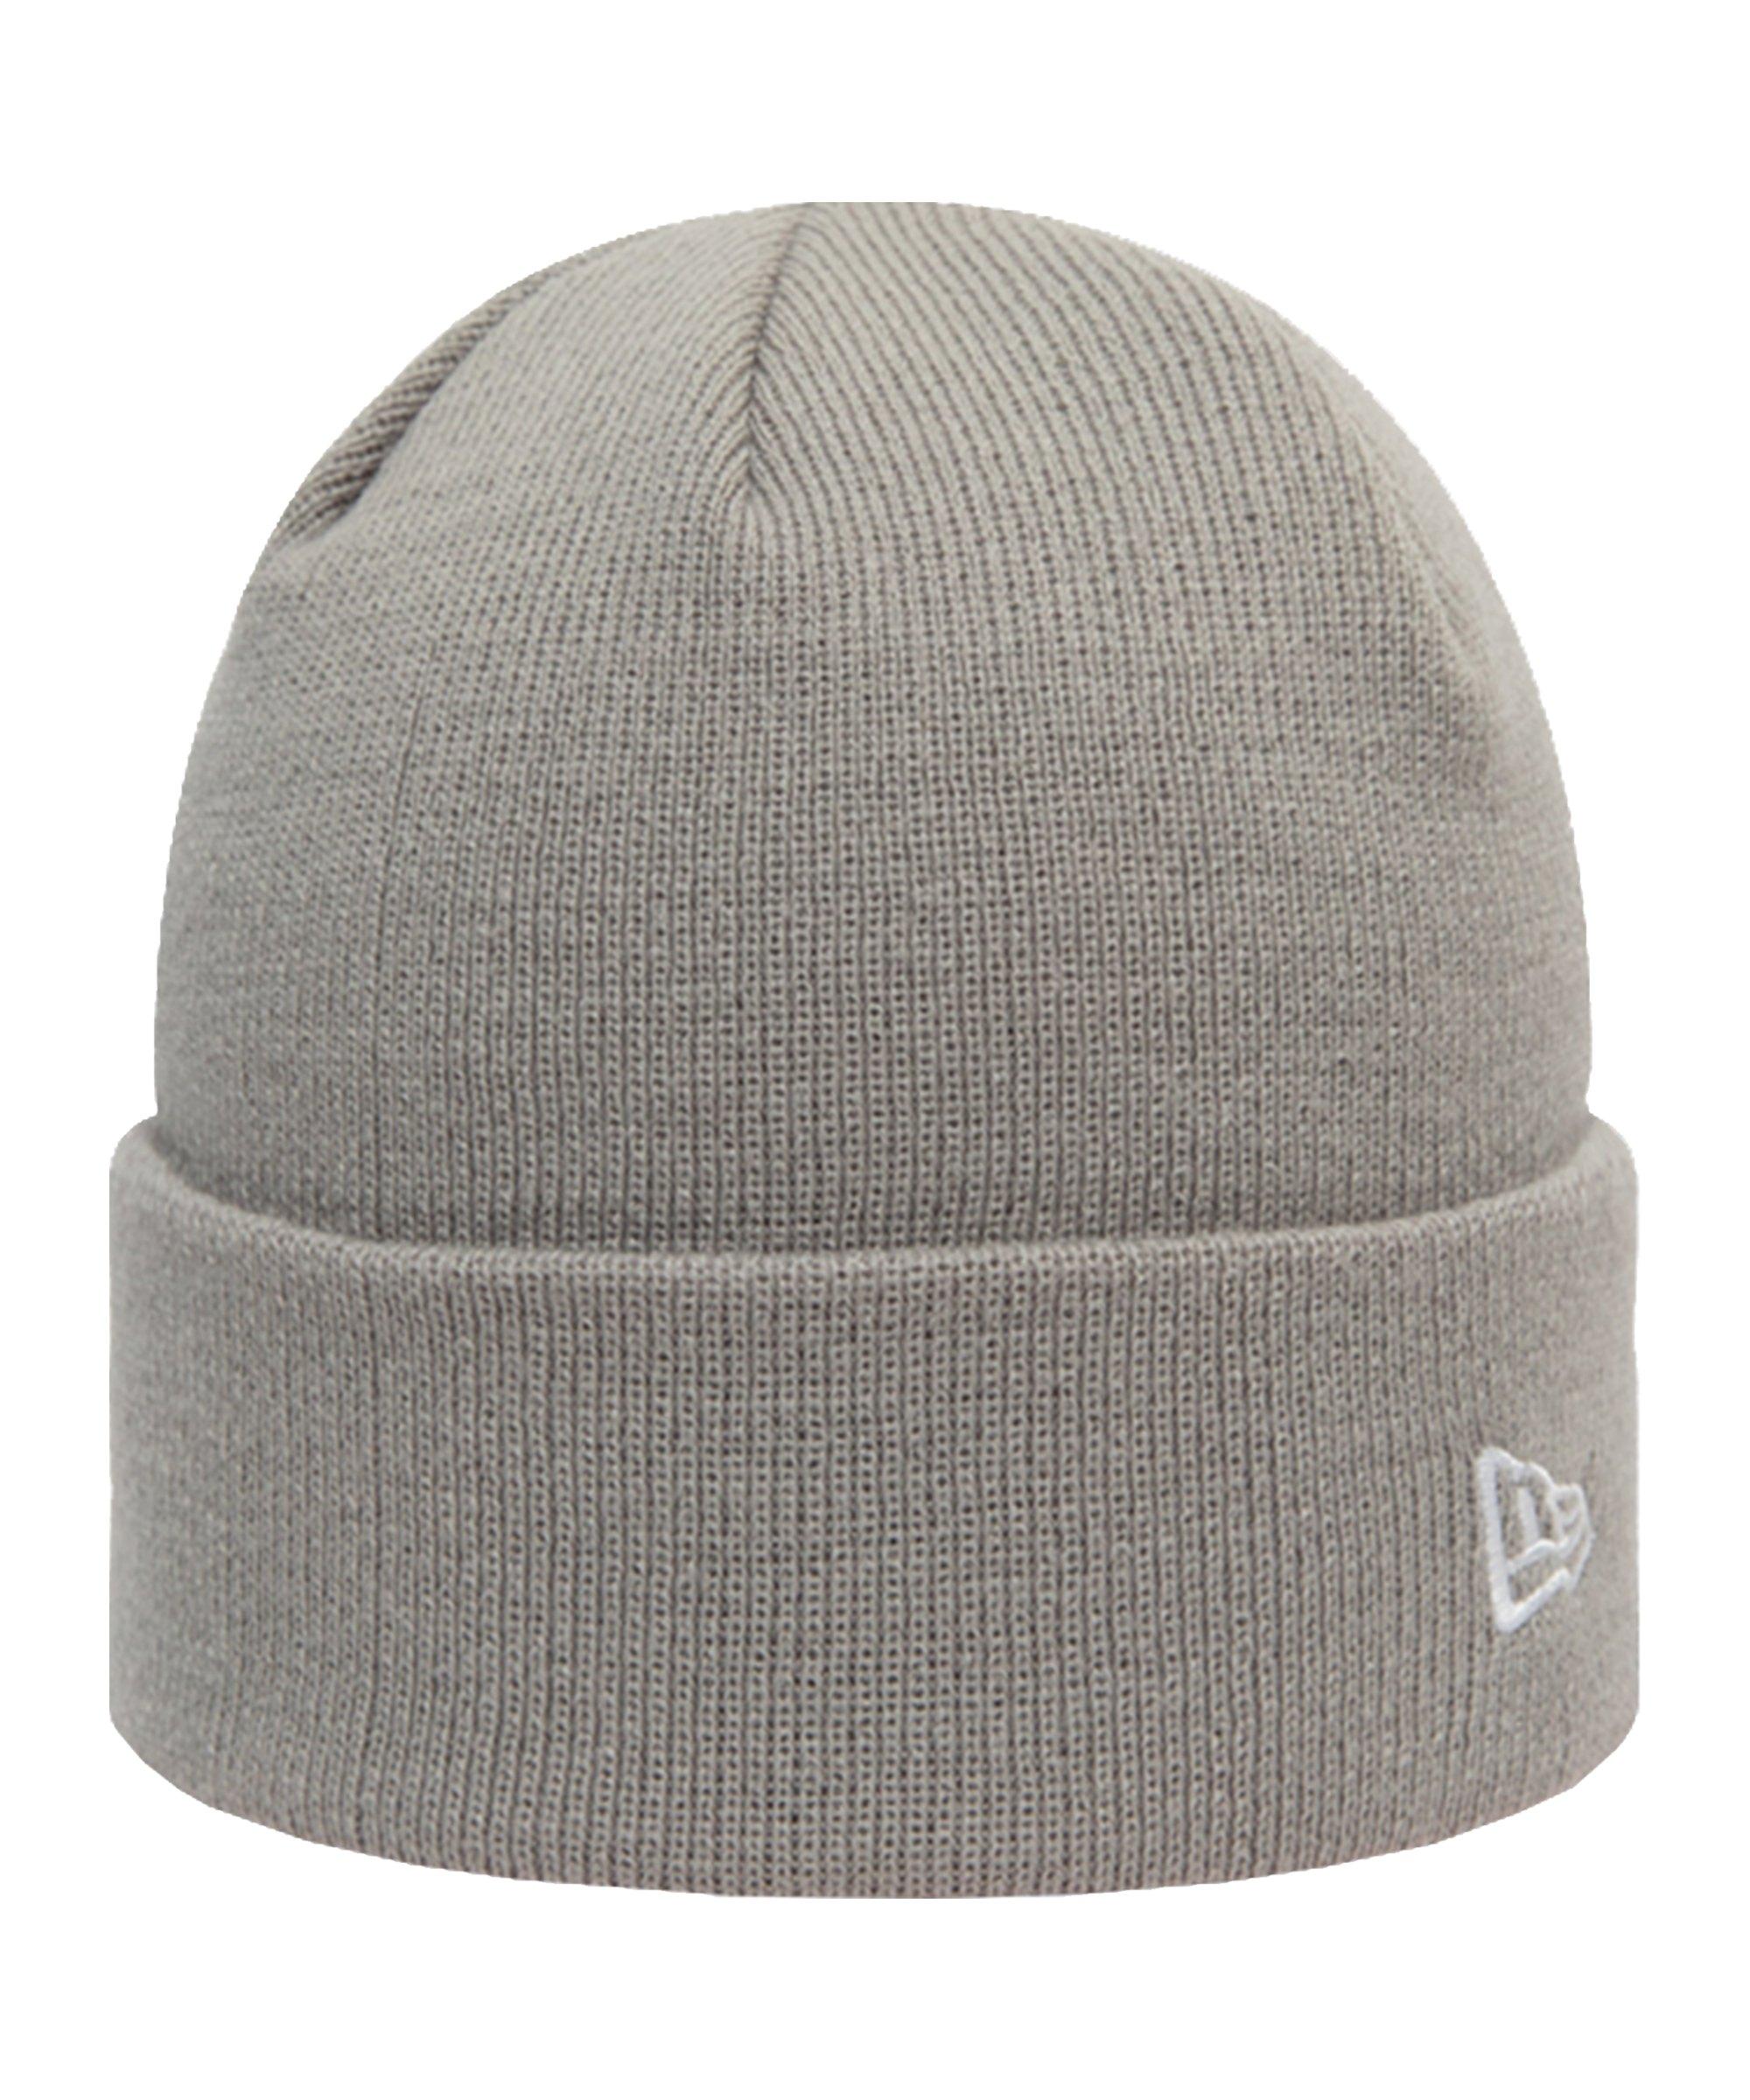 New Era Pop Cuff Knit Short Mütze Grau FGRA - grau